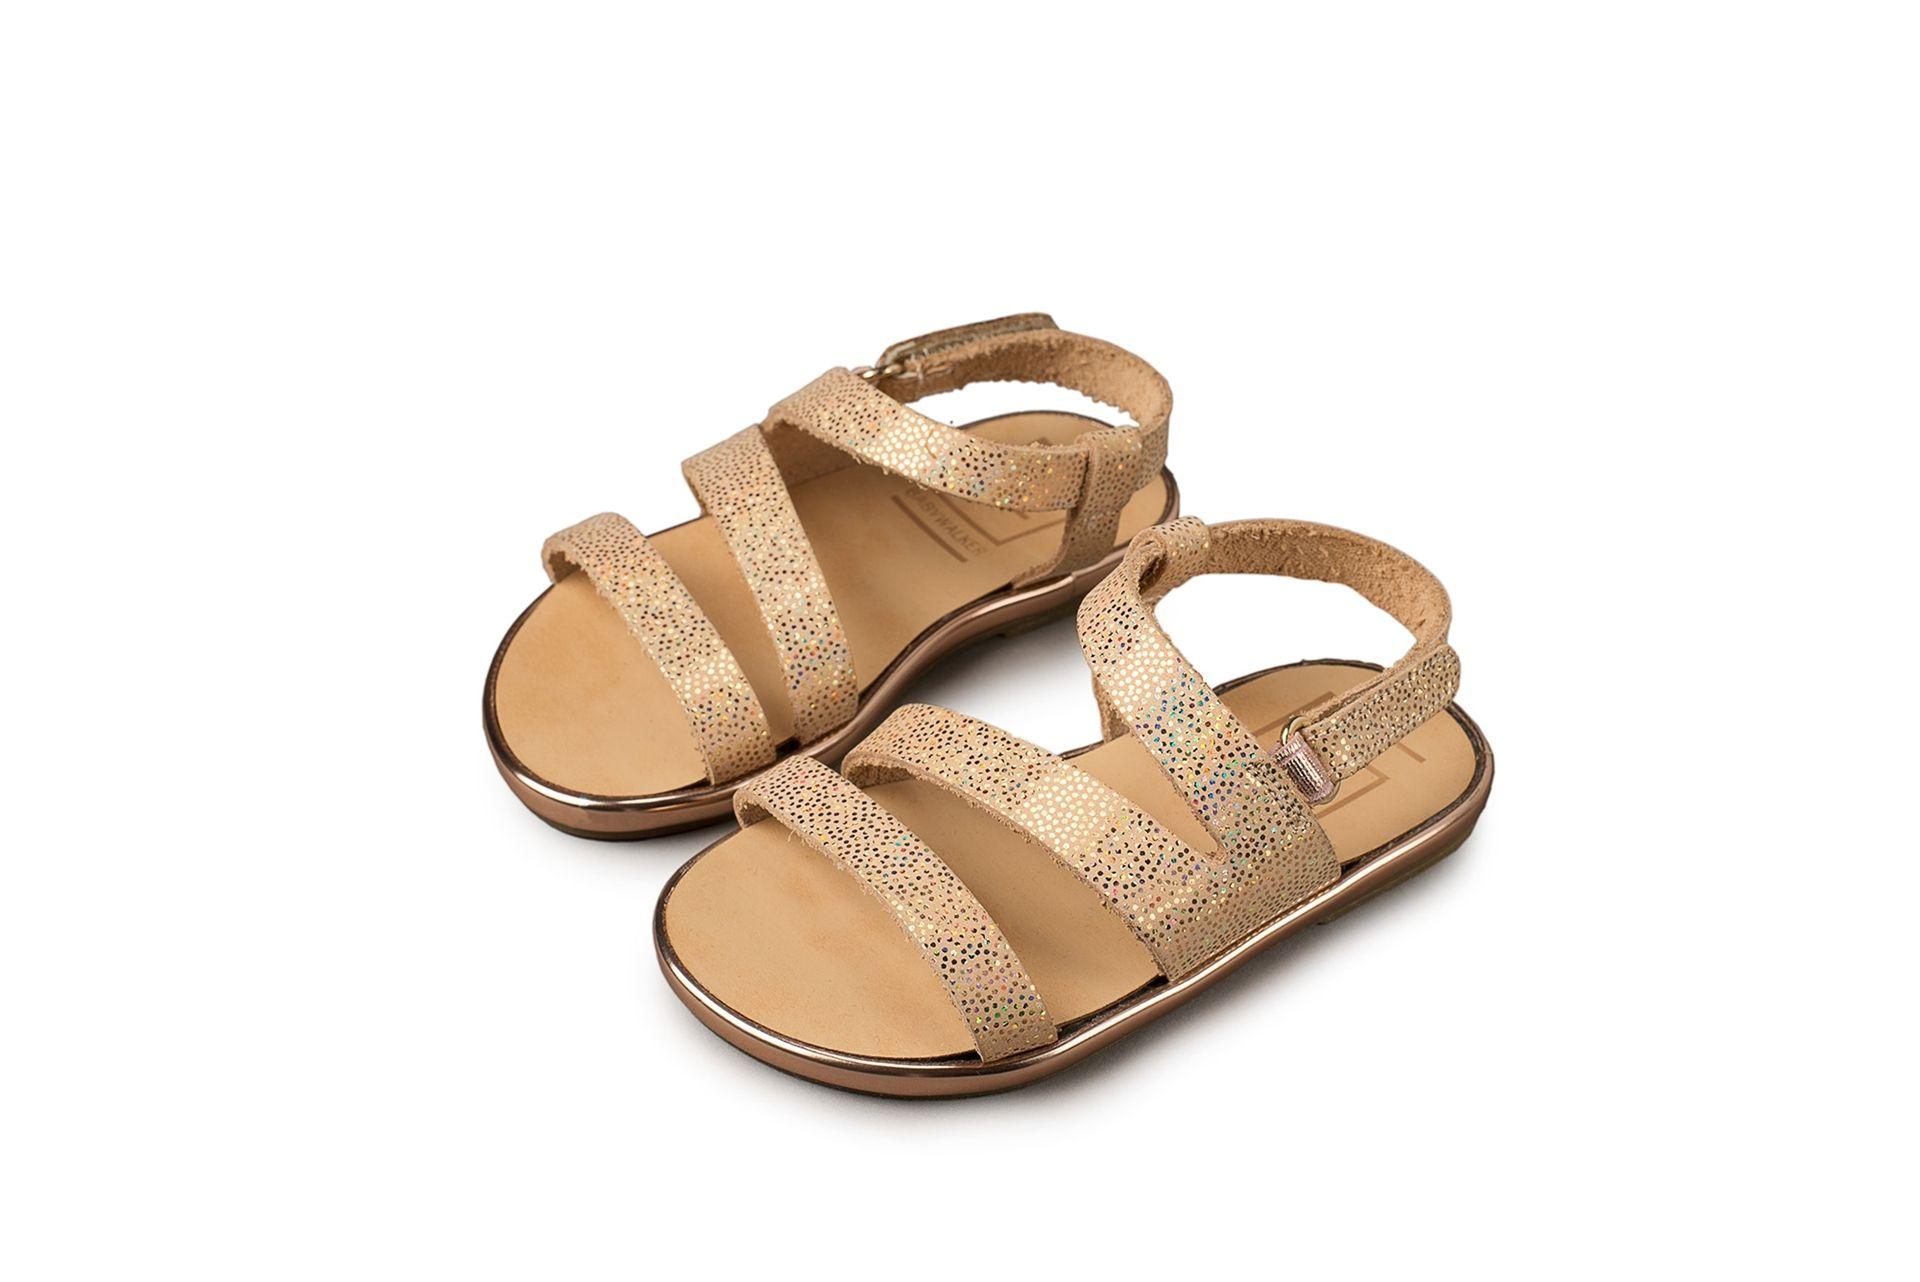 e5bd8370633 Αρχαιοελληνικά Πέδιλα με Δαντελένιο Φιόγκο Babywalker EXC5701 | Babywalker  Βαπτιστικά Παπούτσια για Κορίτσι Collection 2019 | Shoes, Fashion, Sandals